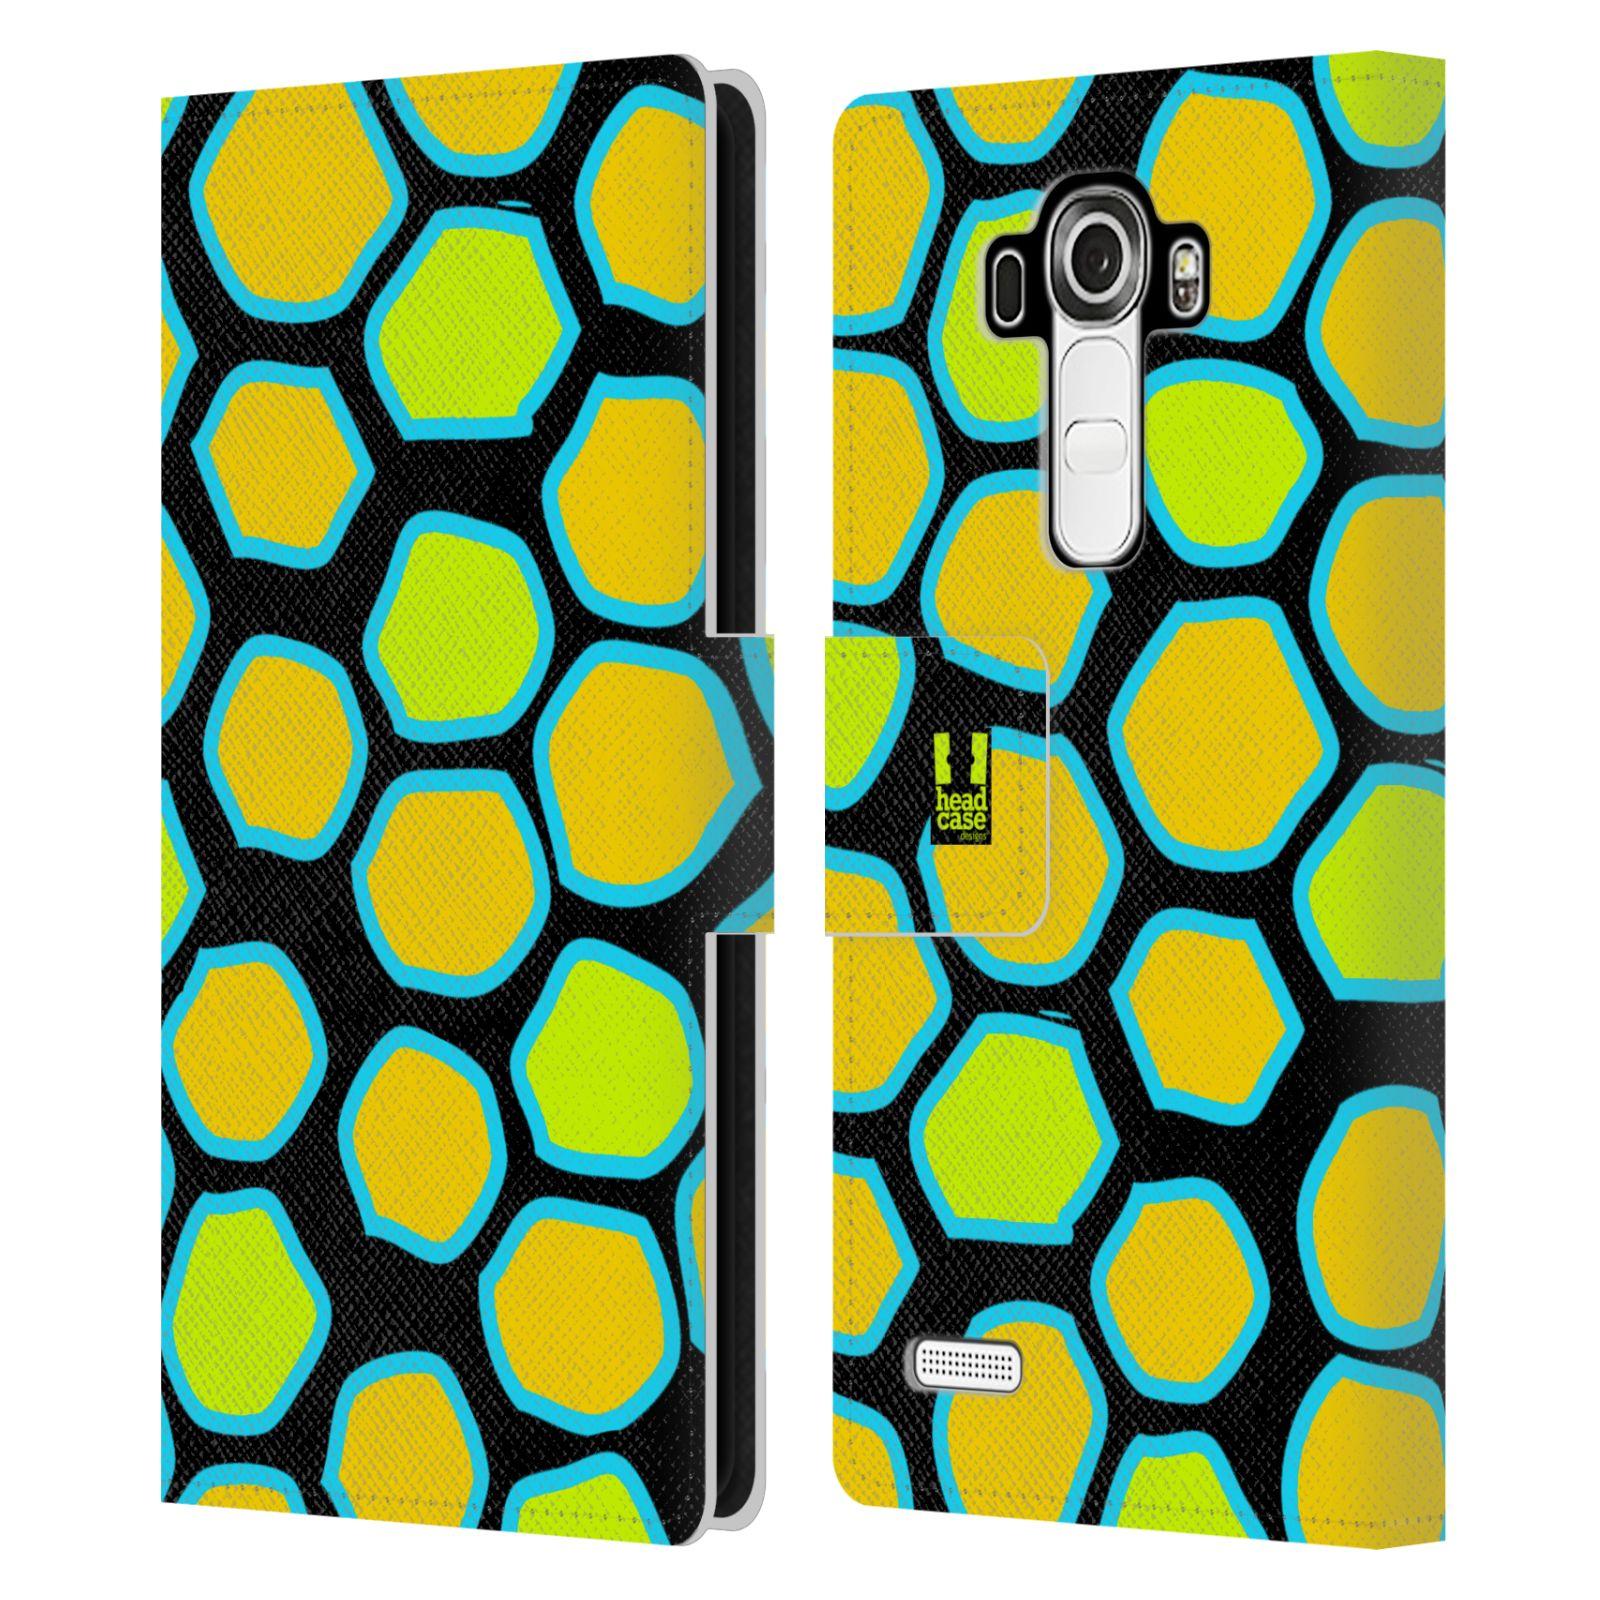 HEAD CASE Flipové pouzdro pro mobil LG G4 (H815) Zvířecí barevné vzory žlutý had